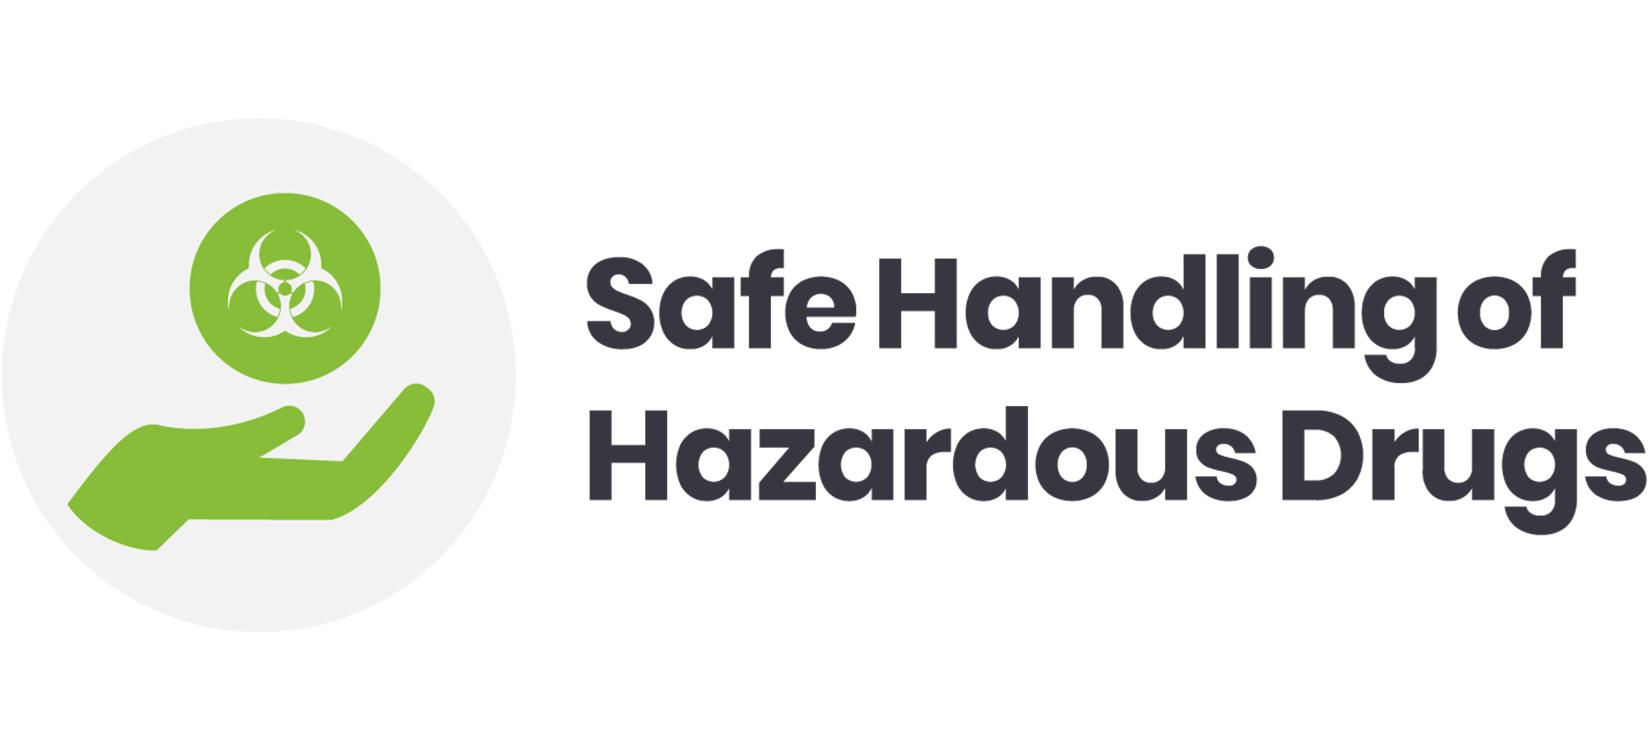 Safe Handling of Hazardous Drugs